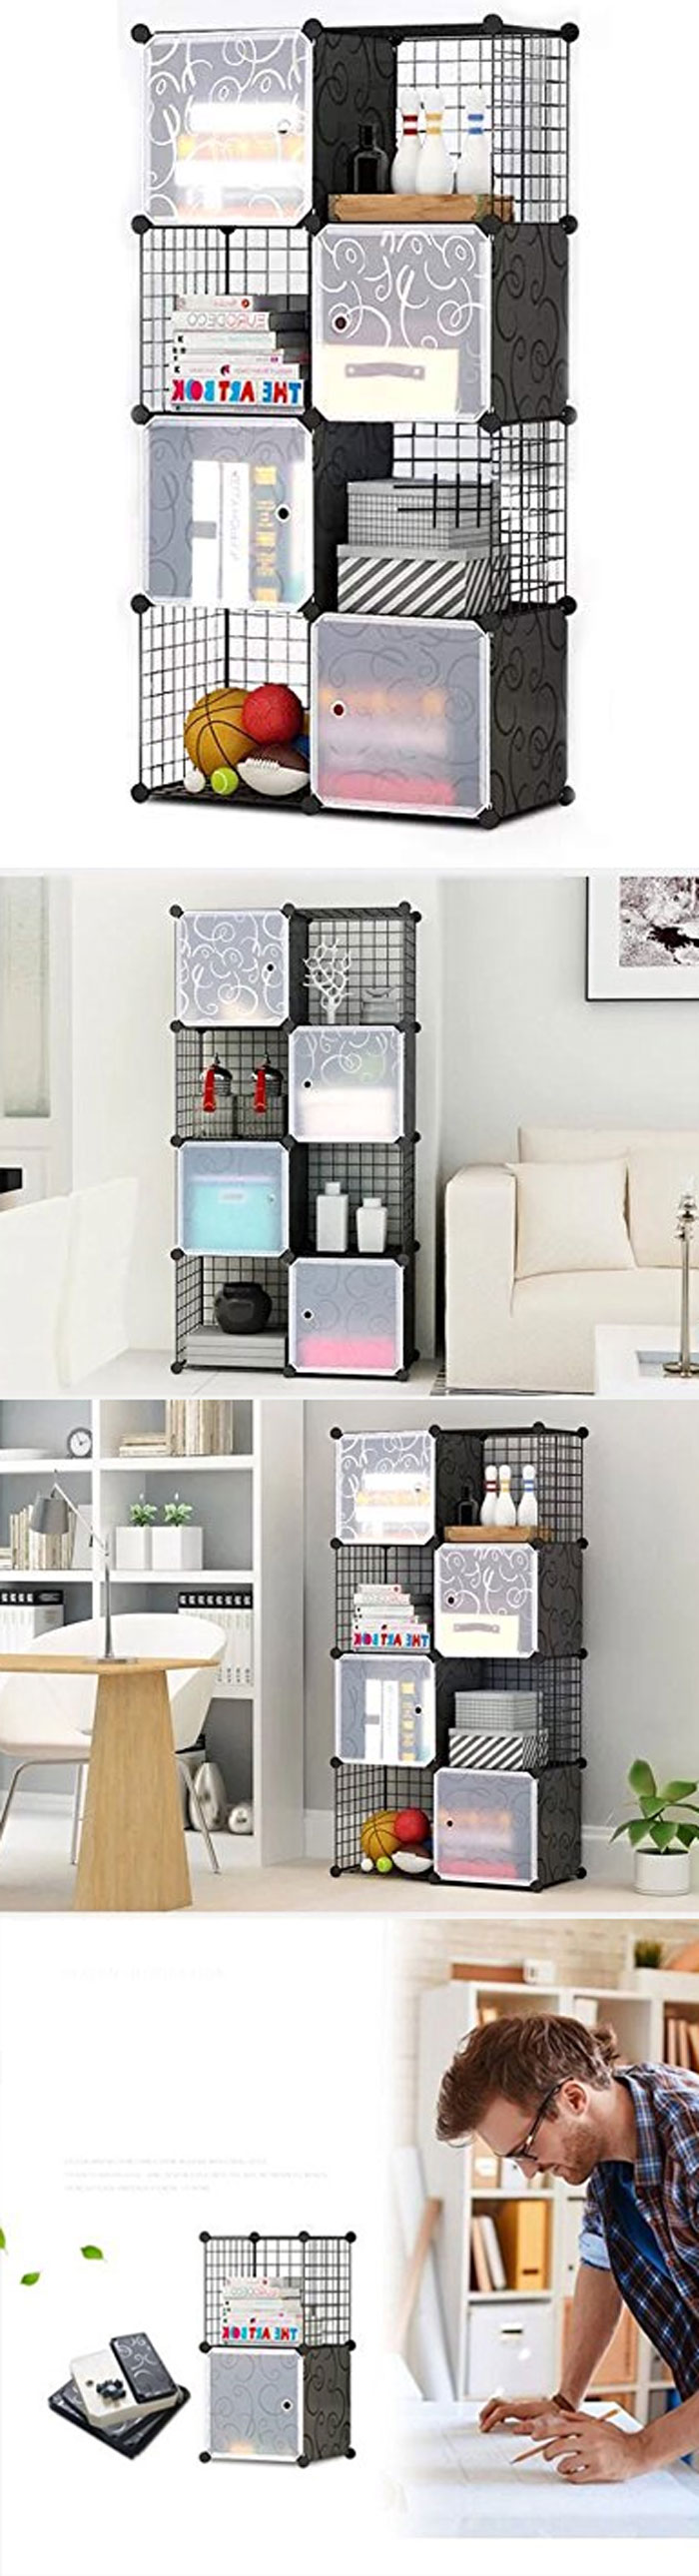 Intelligent Plastic Portable Grill + Cube Cabinet - 8 Cube